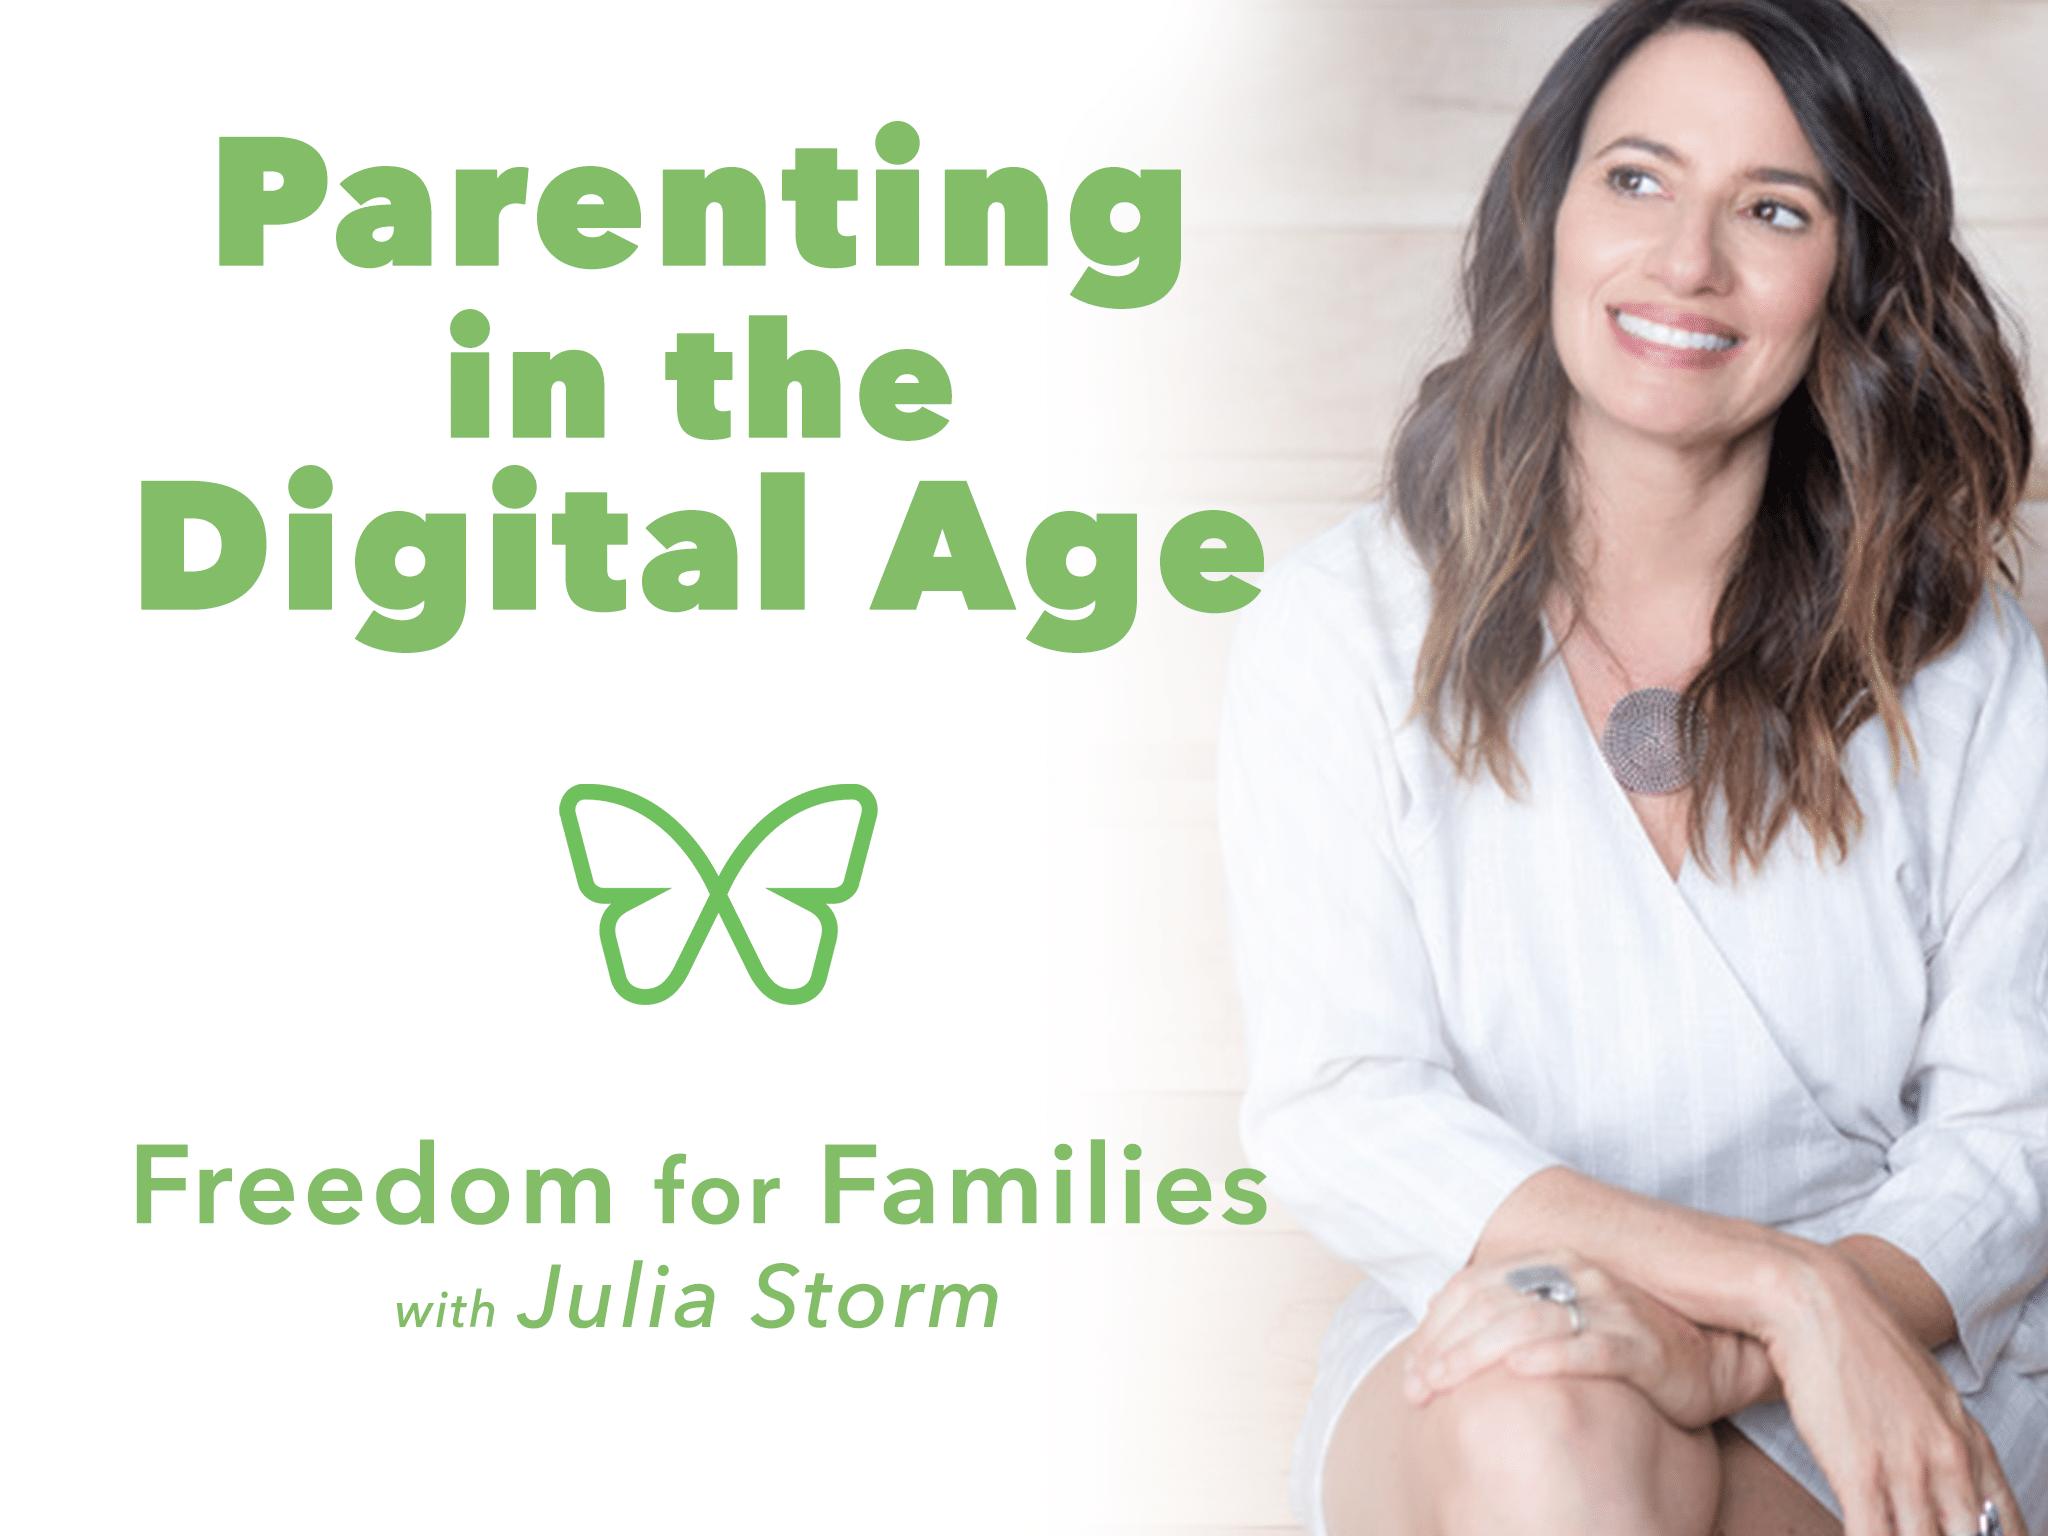 Julia Storm Freedom for Famlies digital parenting